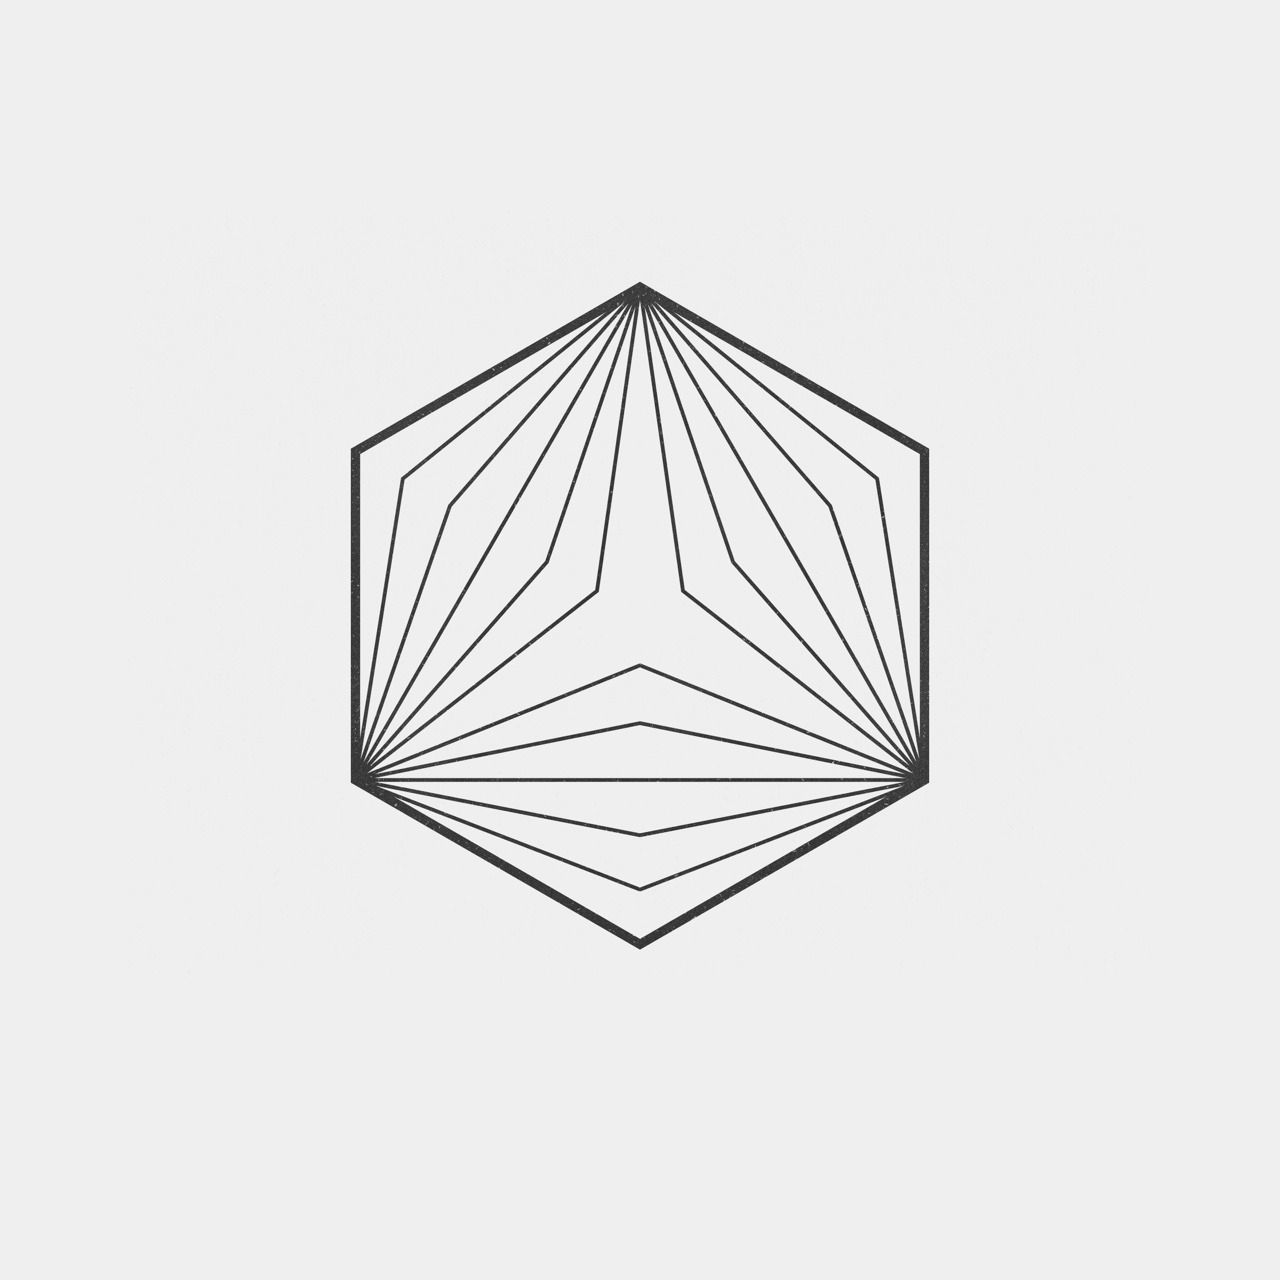 Art Of Geometry Art Abstract Minimalism Shapes Geometric Geometry Aesthetic Tattoo Inspiration Black And W Geometric Graphic Geometric Geometric Logo